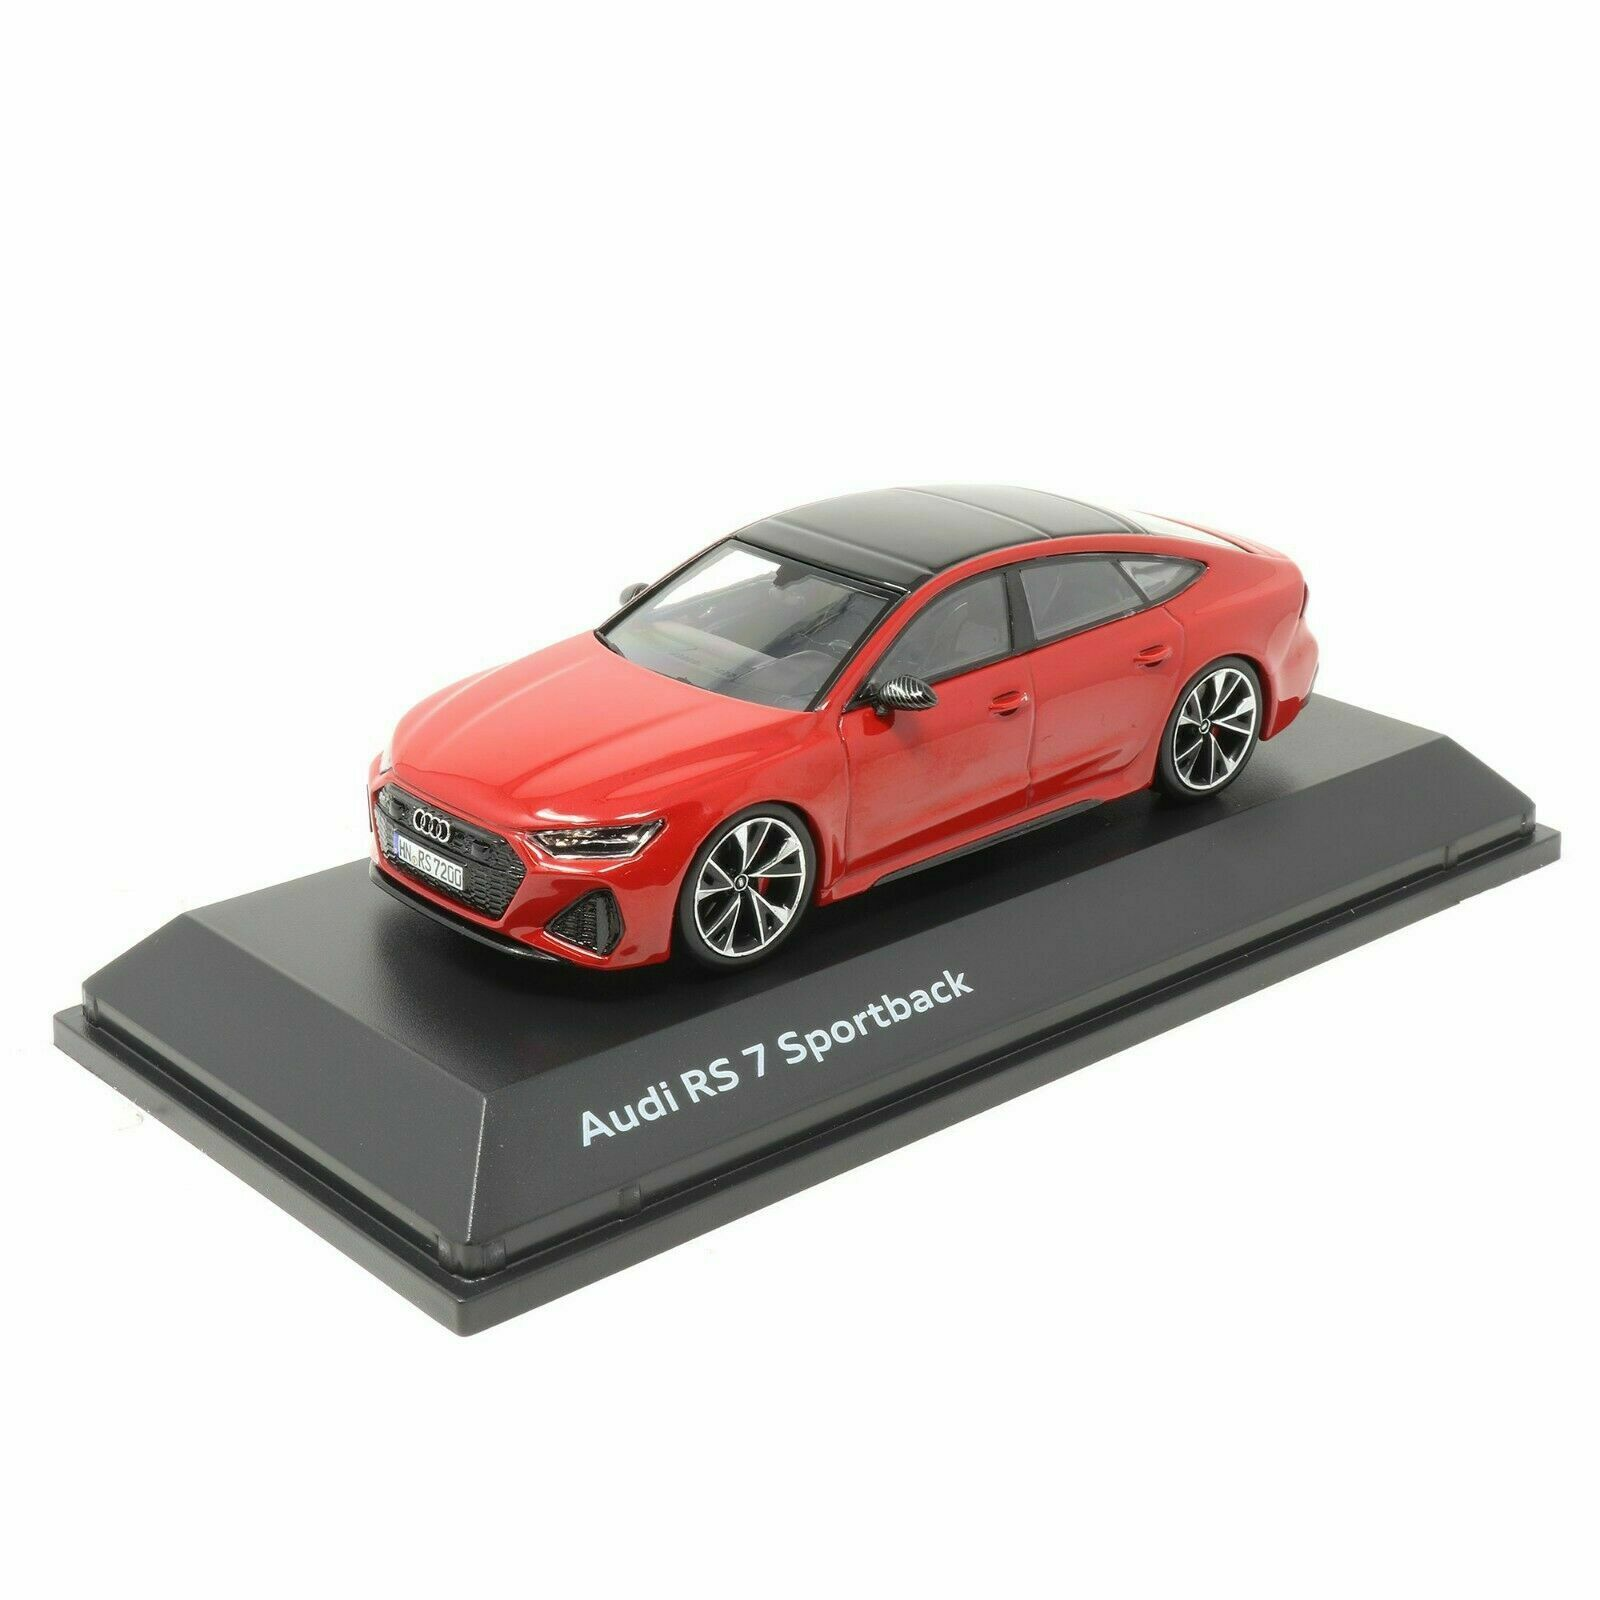 Audi Rs7 Sportback 1 43 Model Car 5011917031 Tango Red Genuine New 2160000050530 Ebay